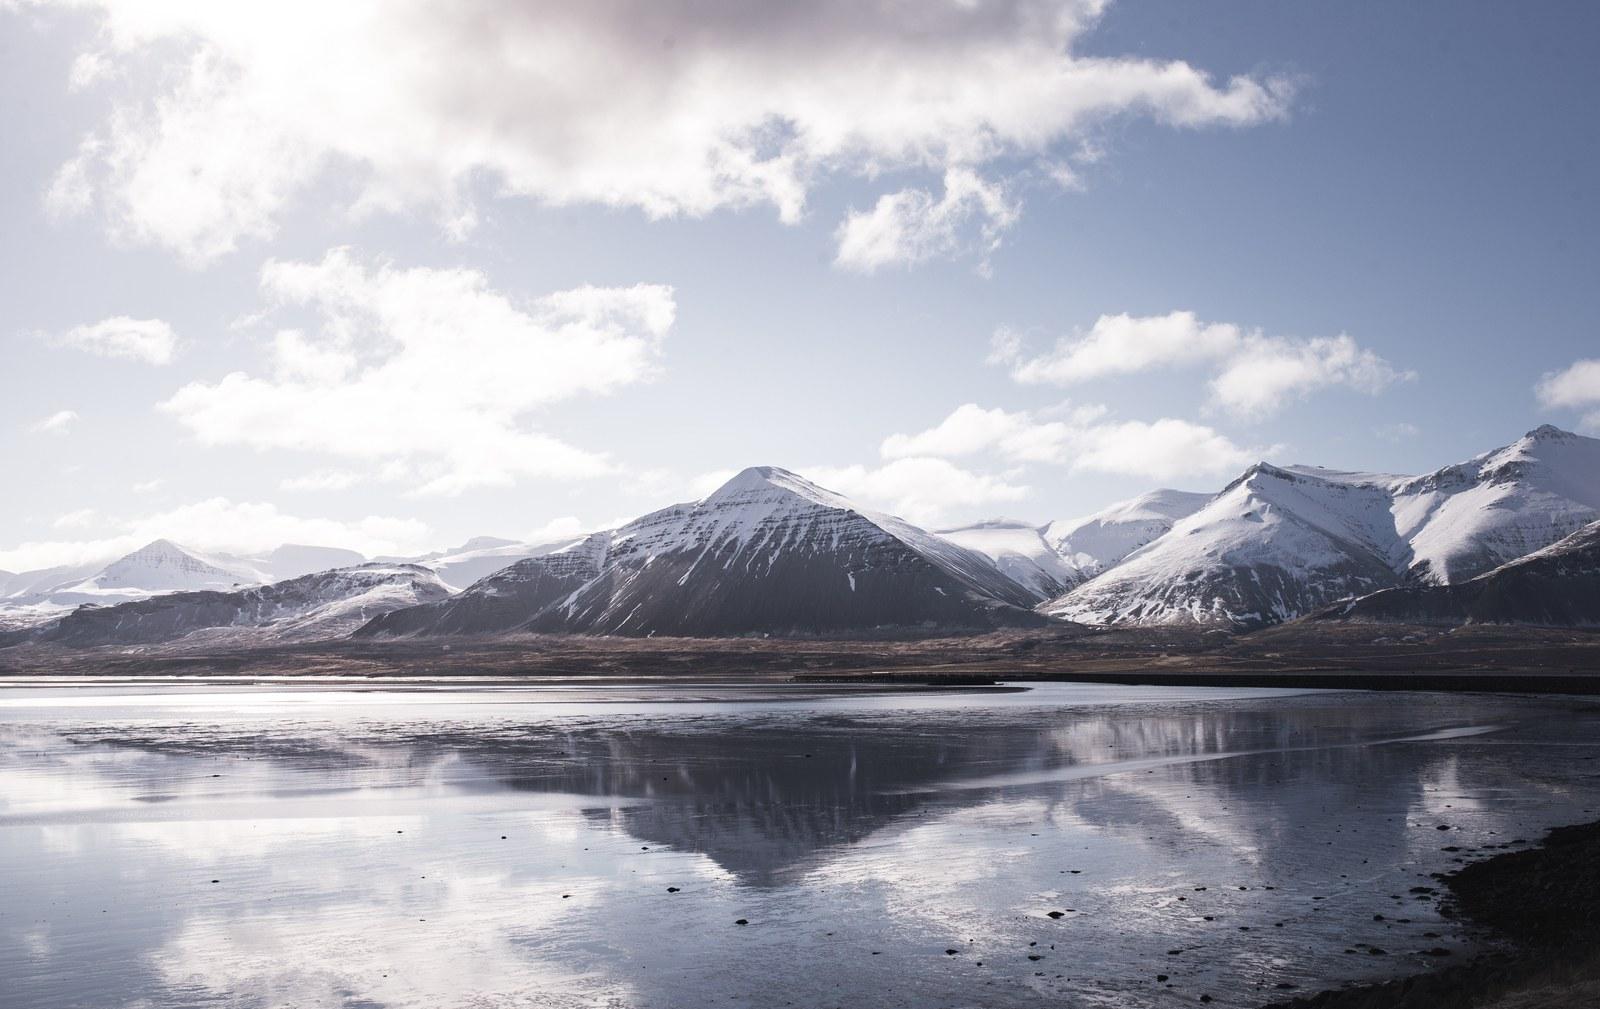 Montagnes typiques d'Islande Akureyri